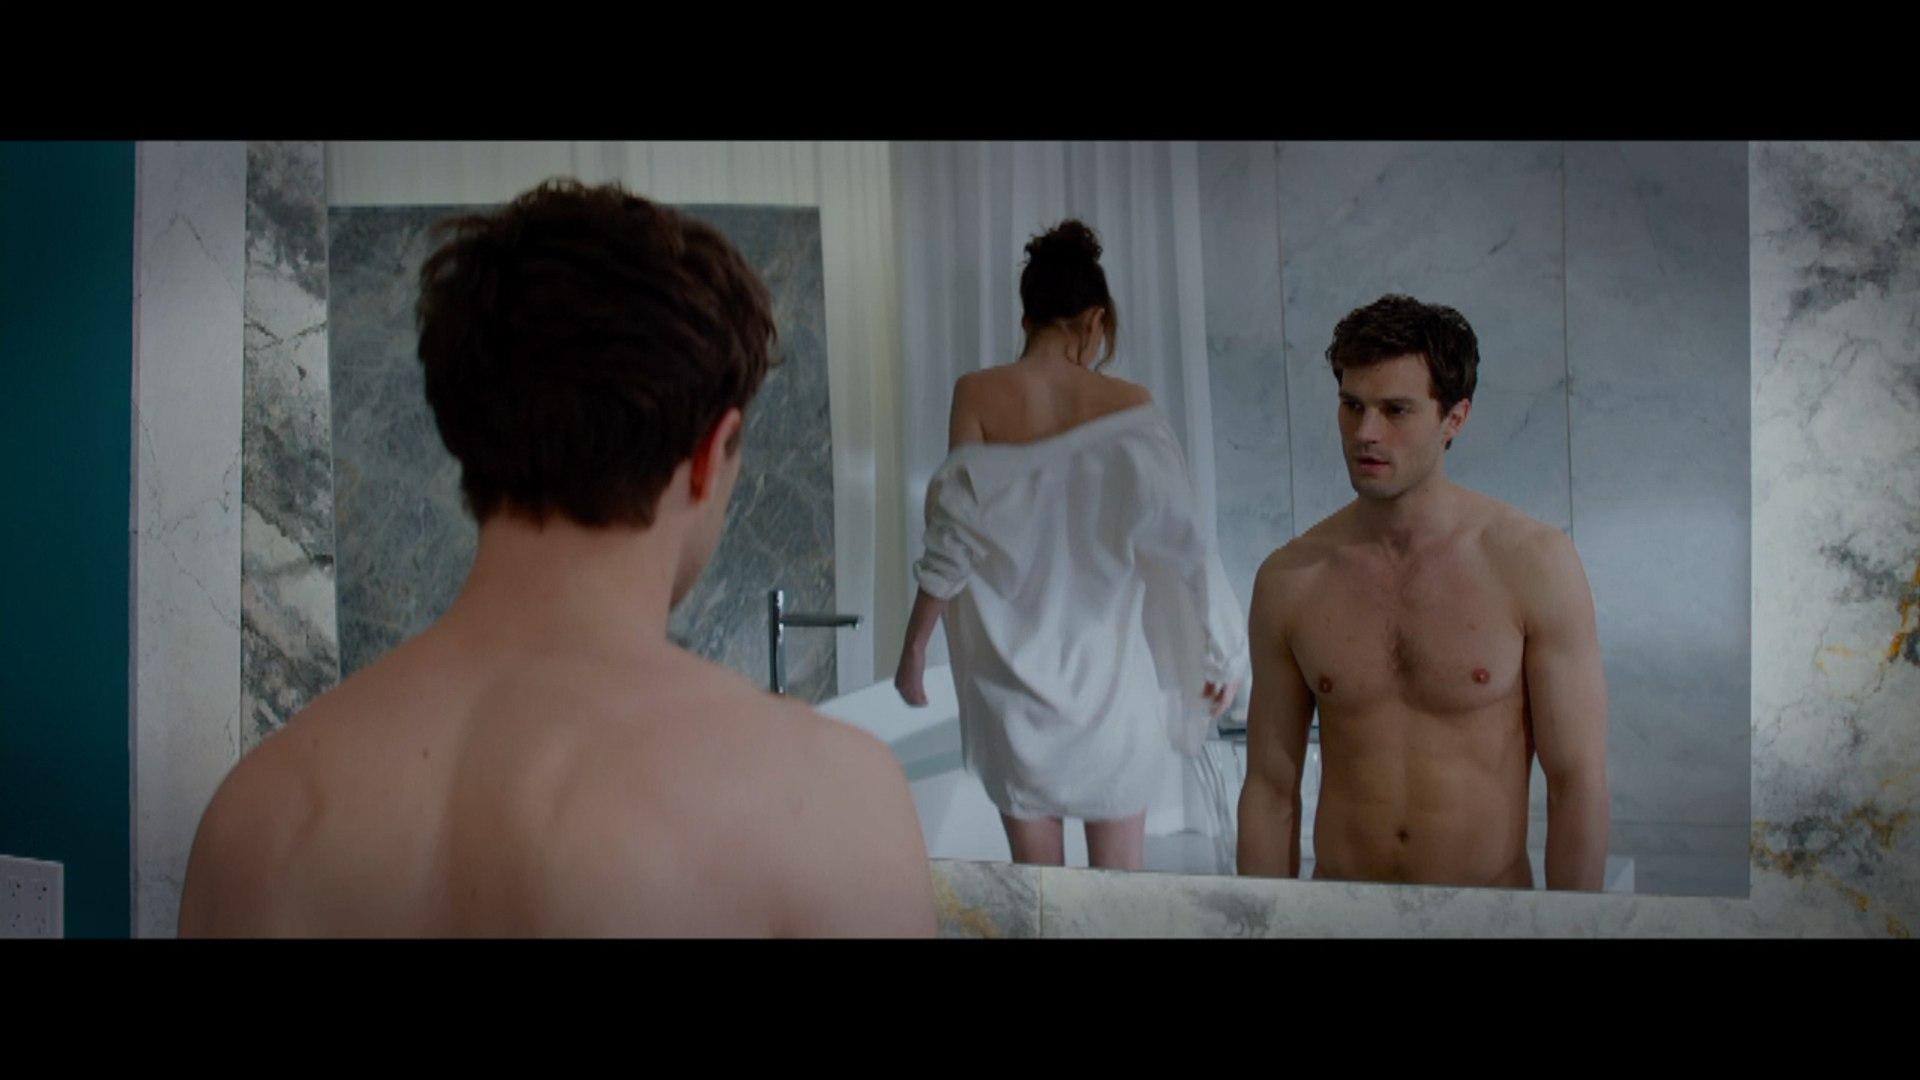 Dakota Johnson Jamie Dornan In Fifty Shades Of Grey First Full Trailer Video Dailymotion